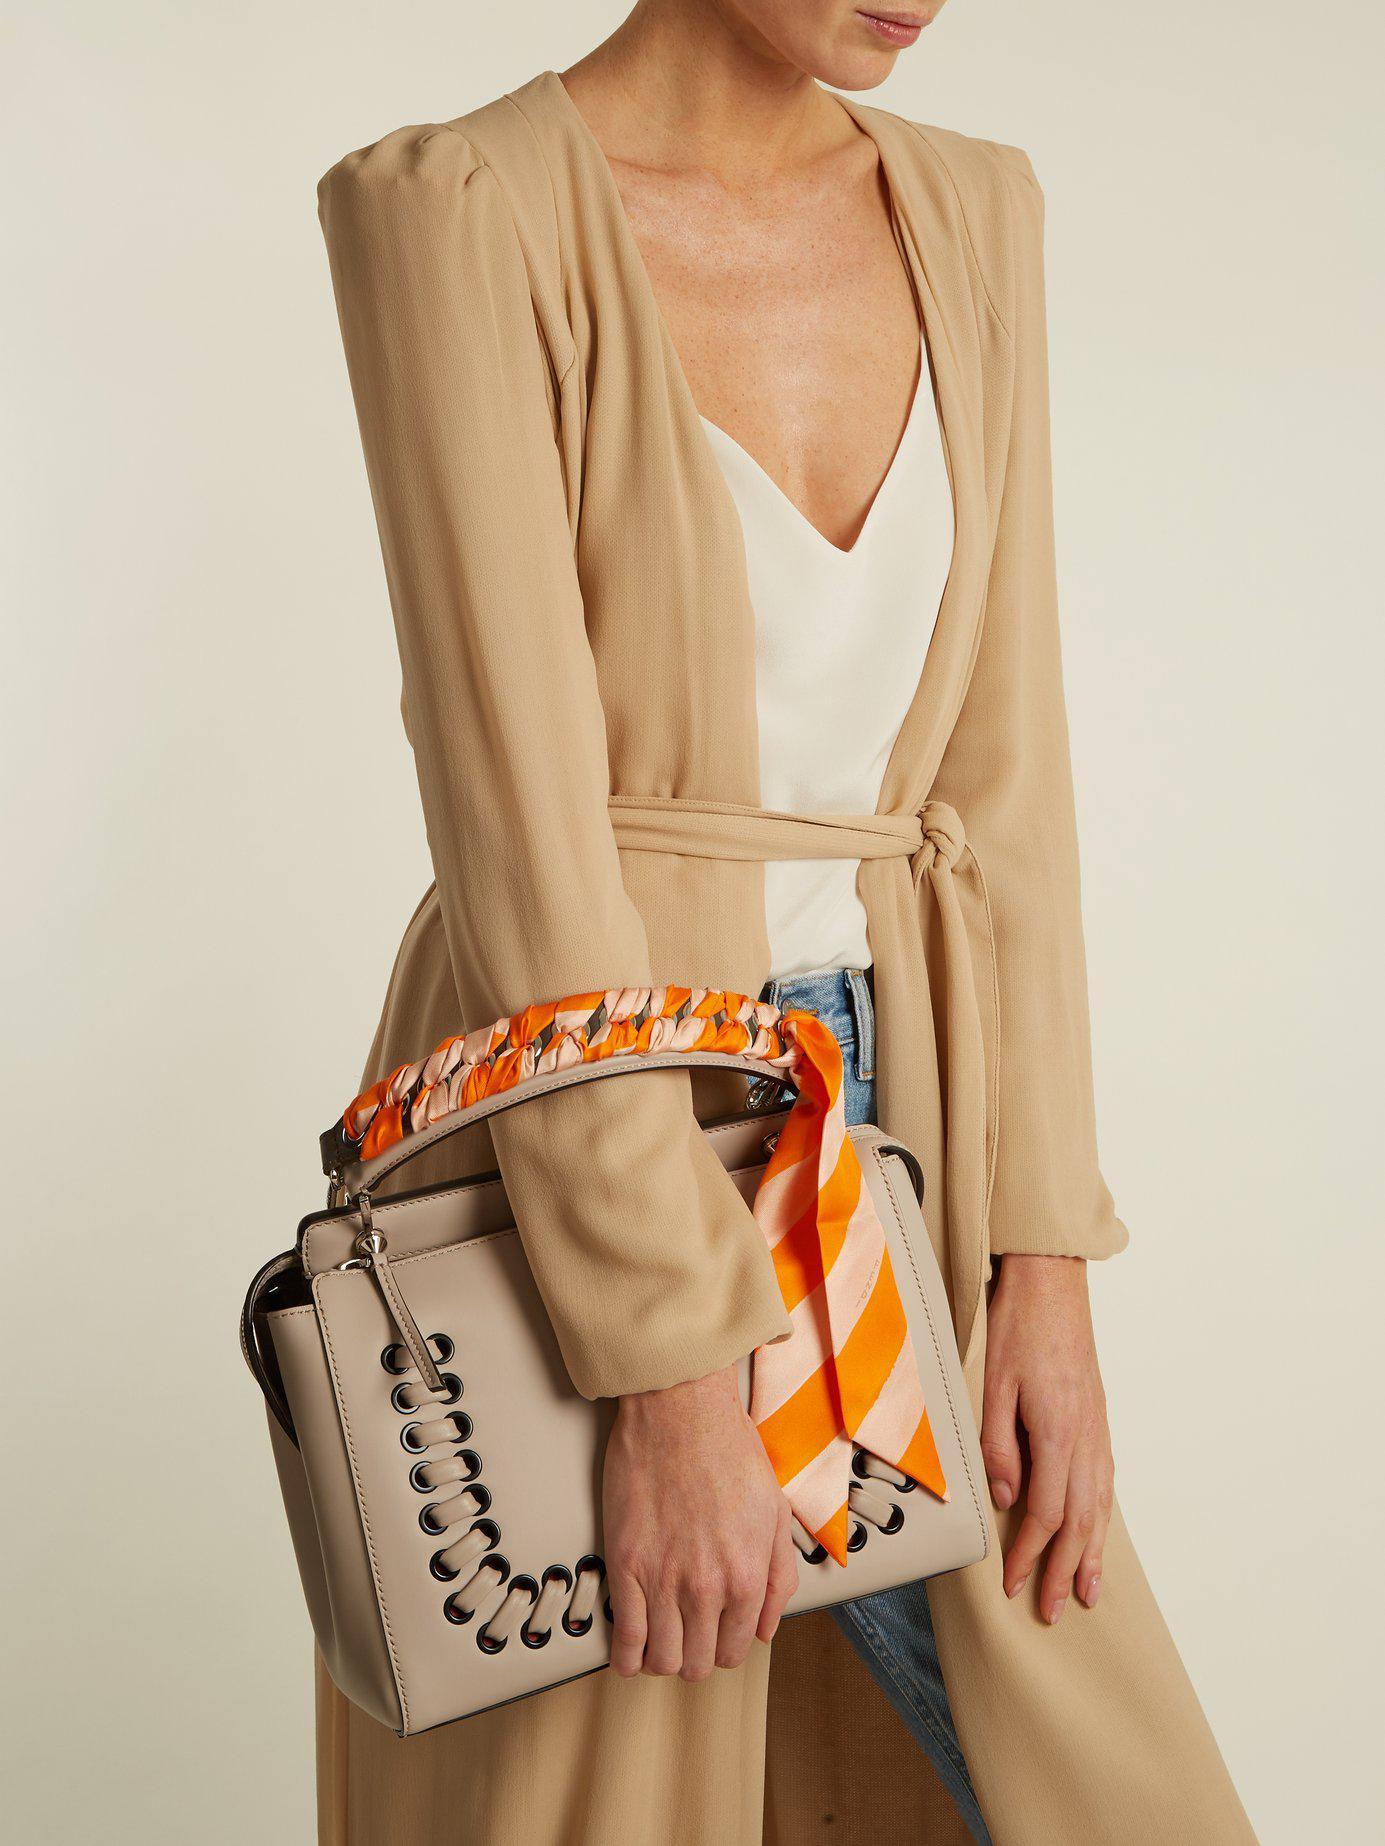 a43331b68c80 Lyst - Fendi Strap You Whipstitched Ribbon Short Bag Strap in Orange